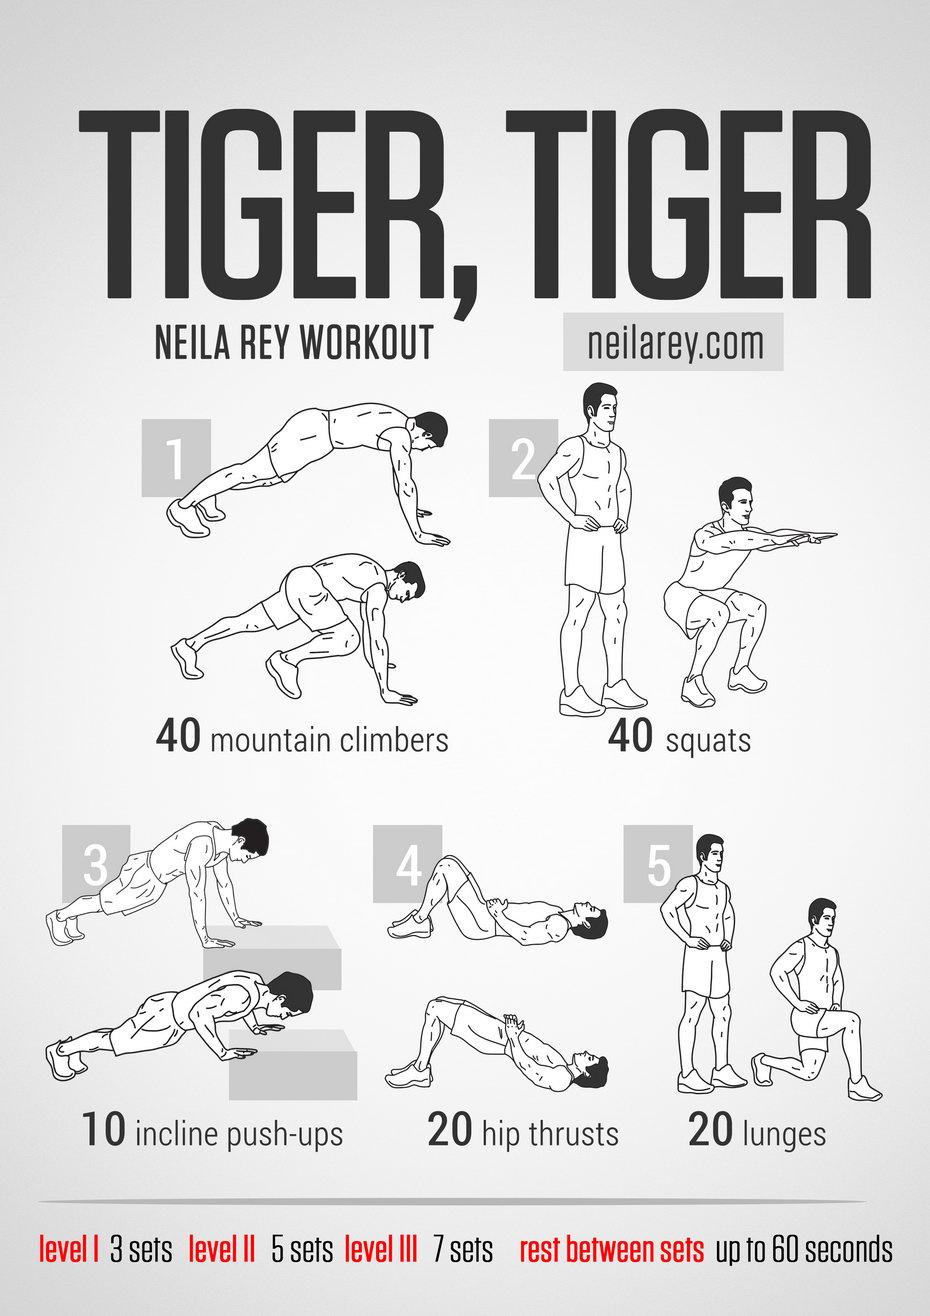 tiger-tiger-workout.jpg